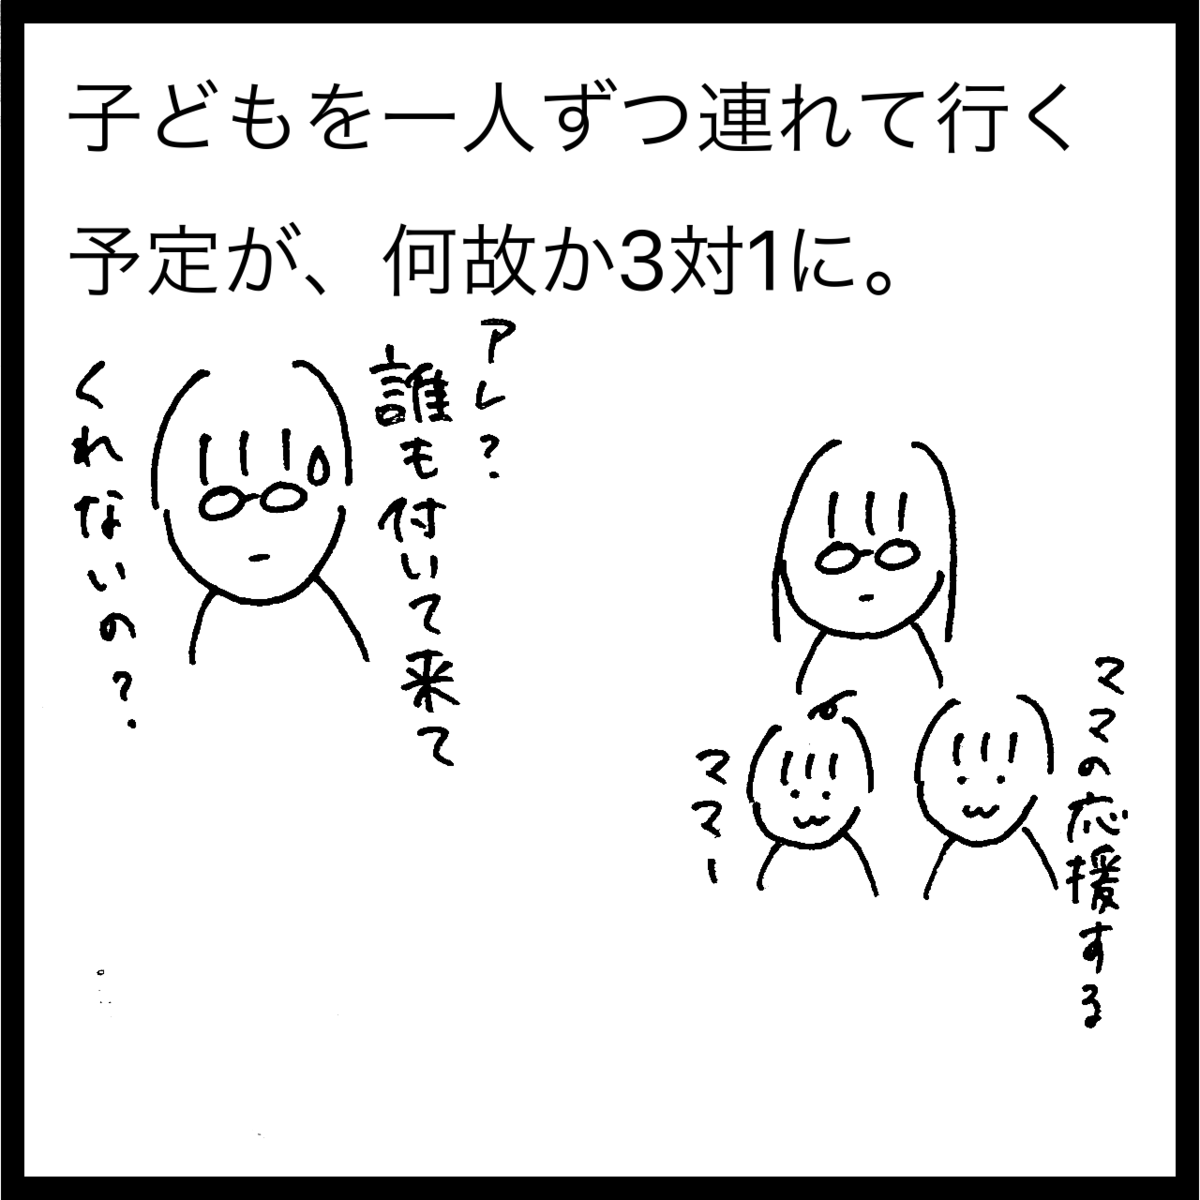 f:id:komyusyomama:20210912075820p:plain